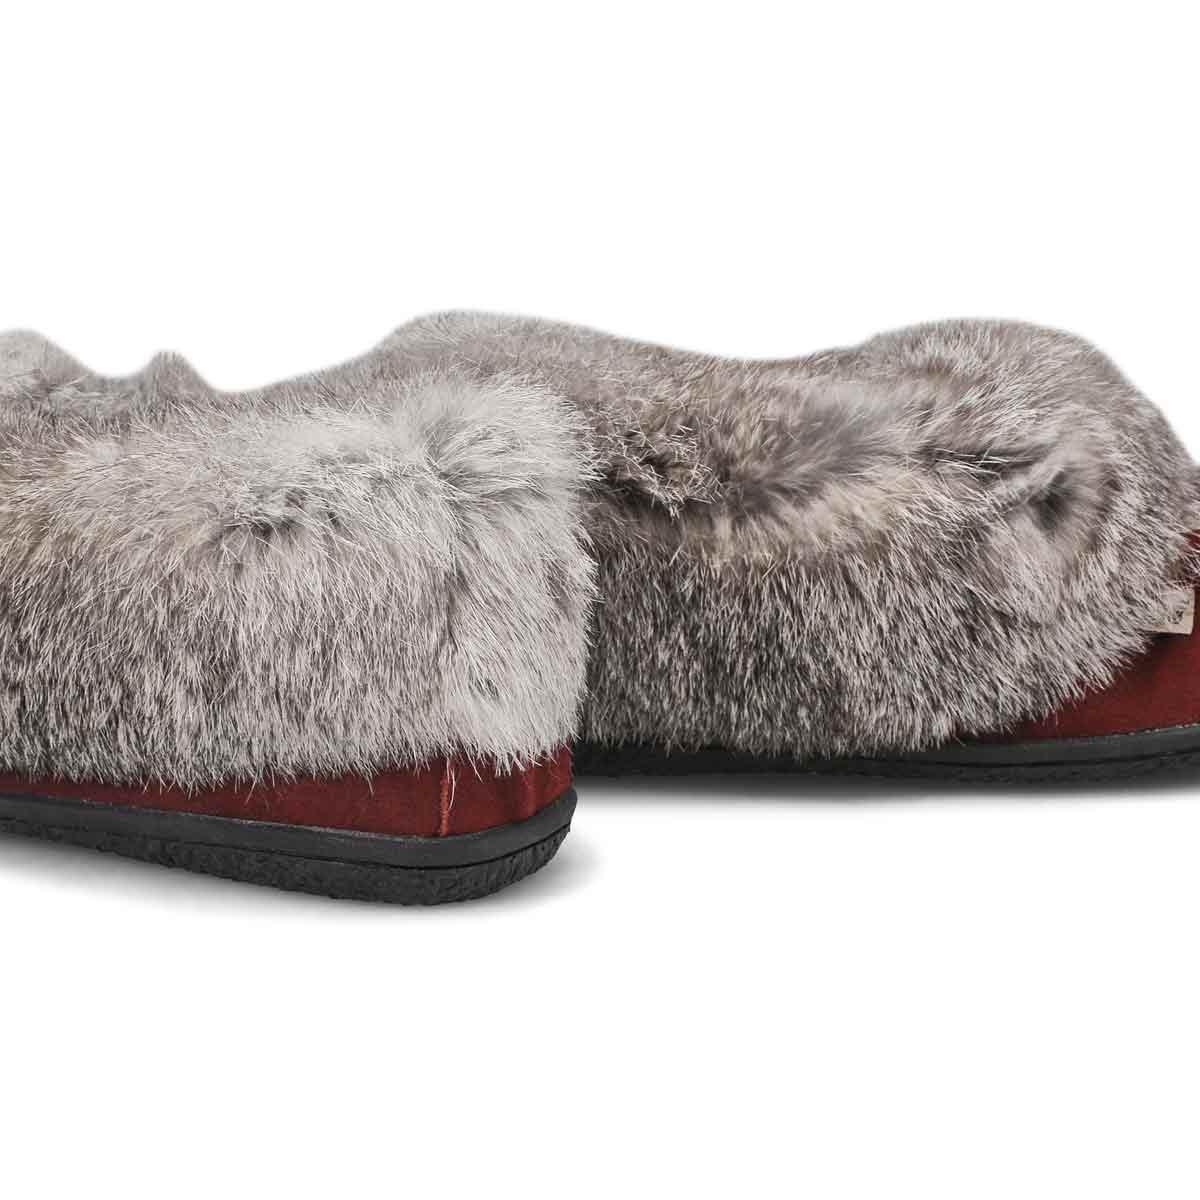 Women's Cute 5 Rabbit Fur Moccasin - Burgundy